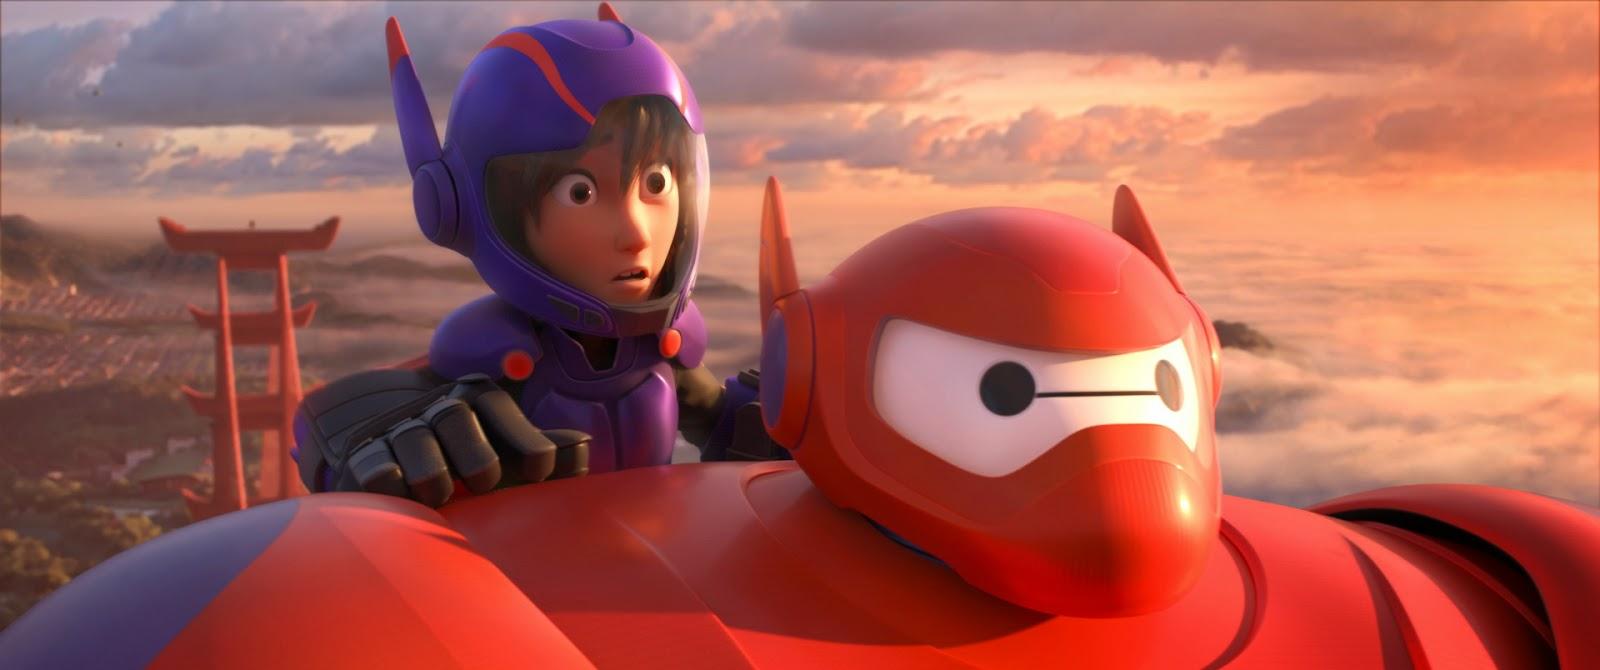 Big Hero 6 animatedfilmreviews.filminspector.com